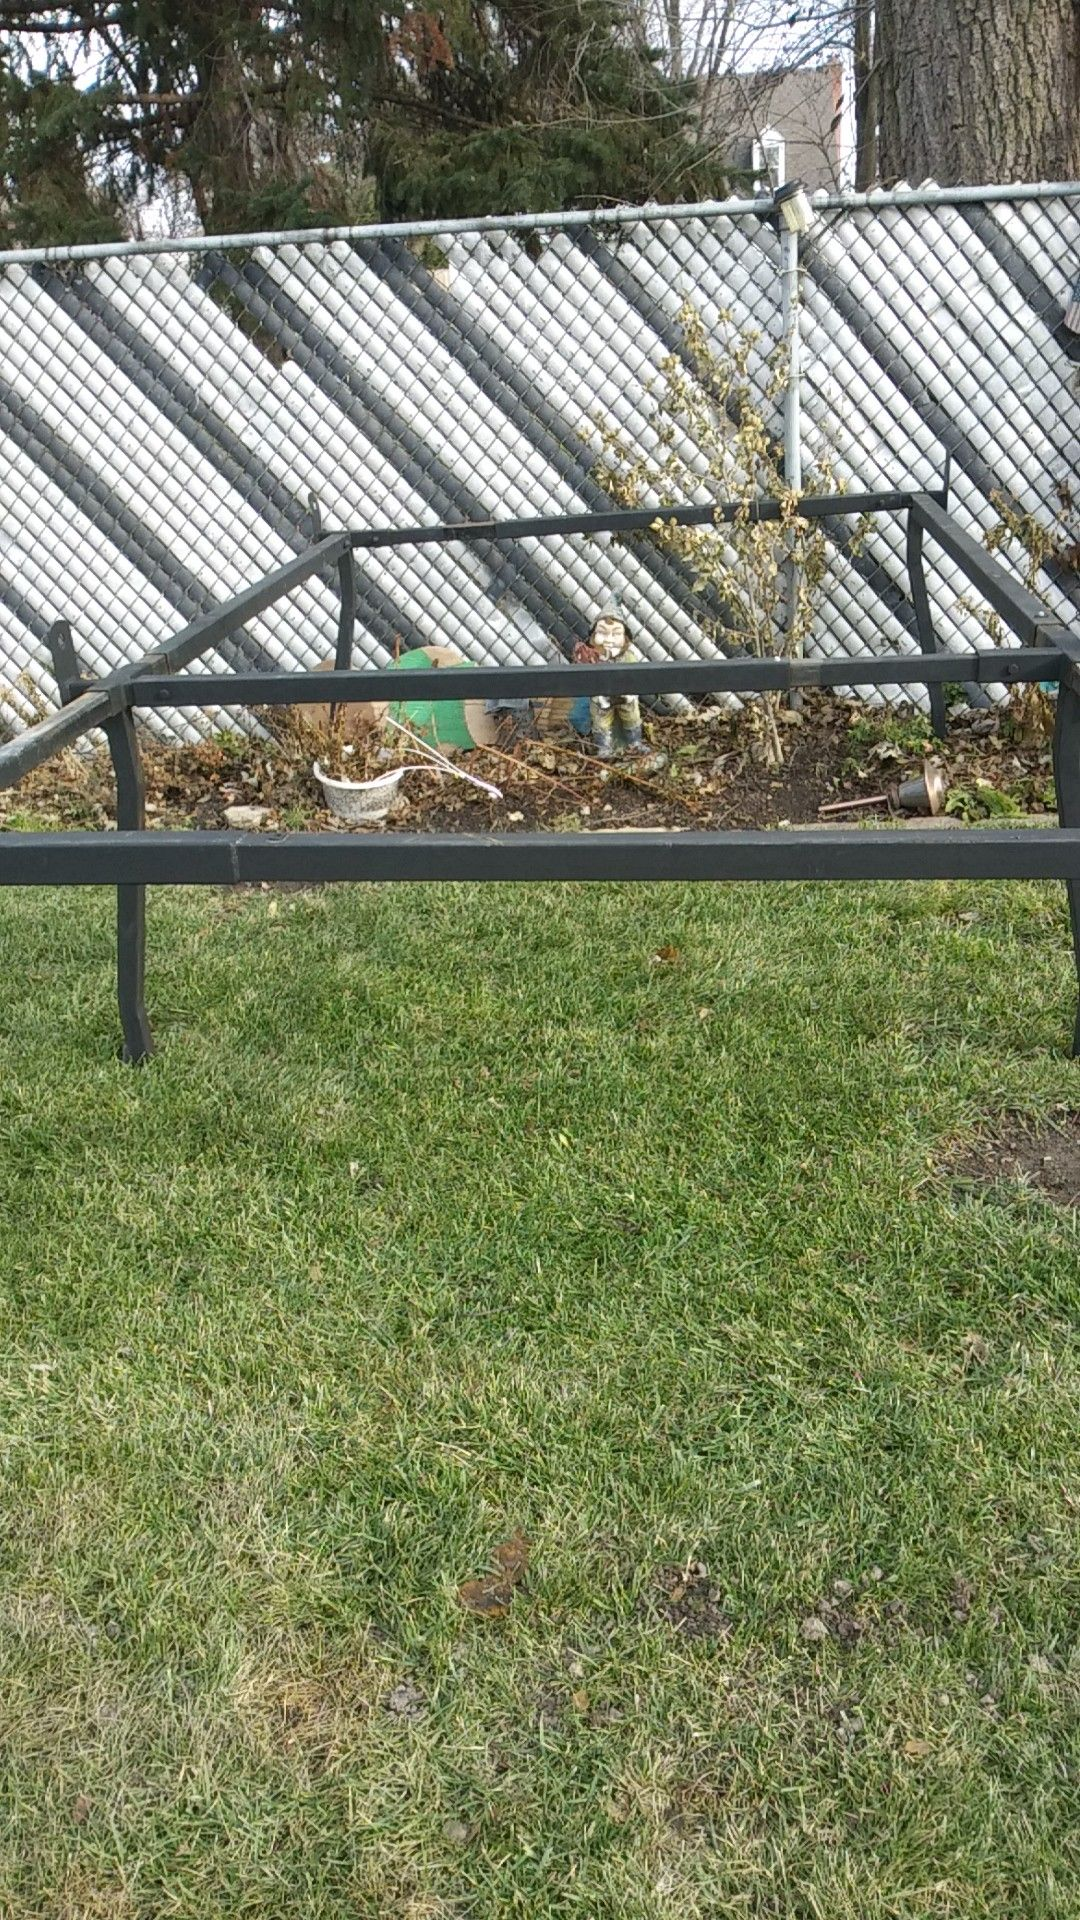 Truck bed ladder rack